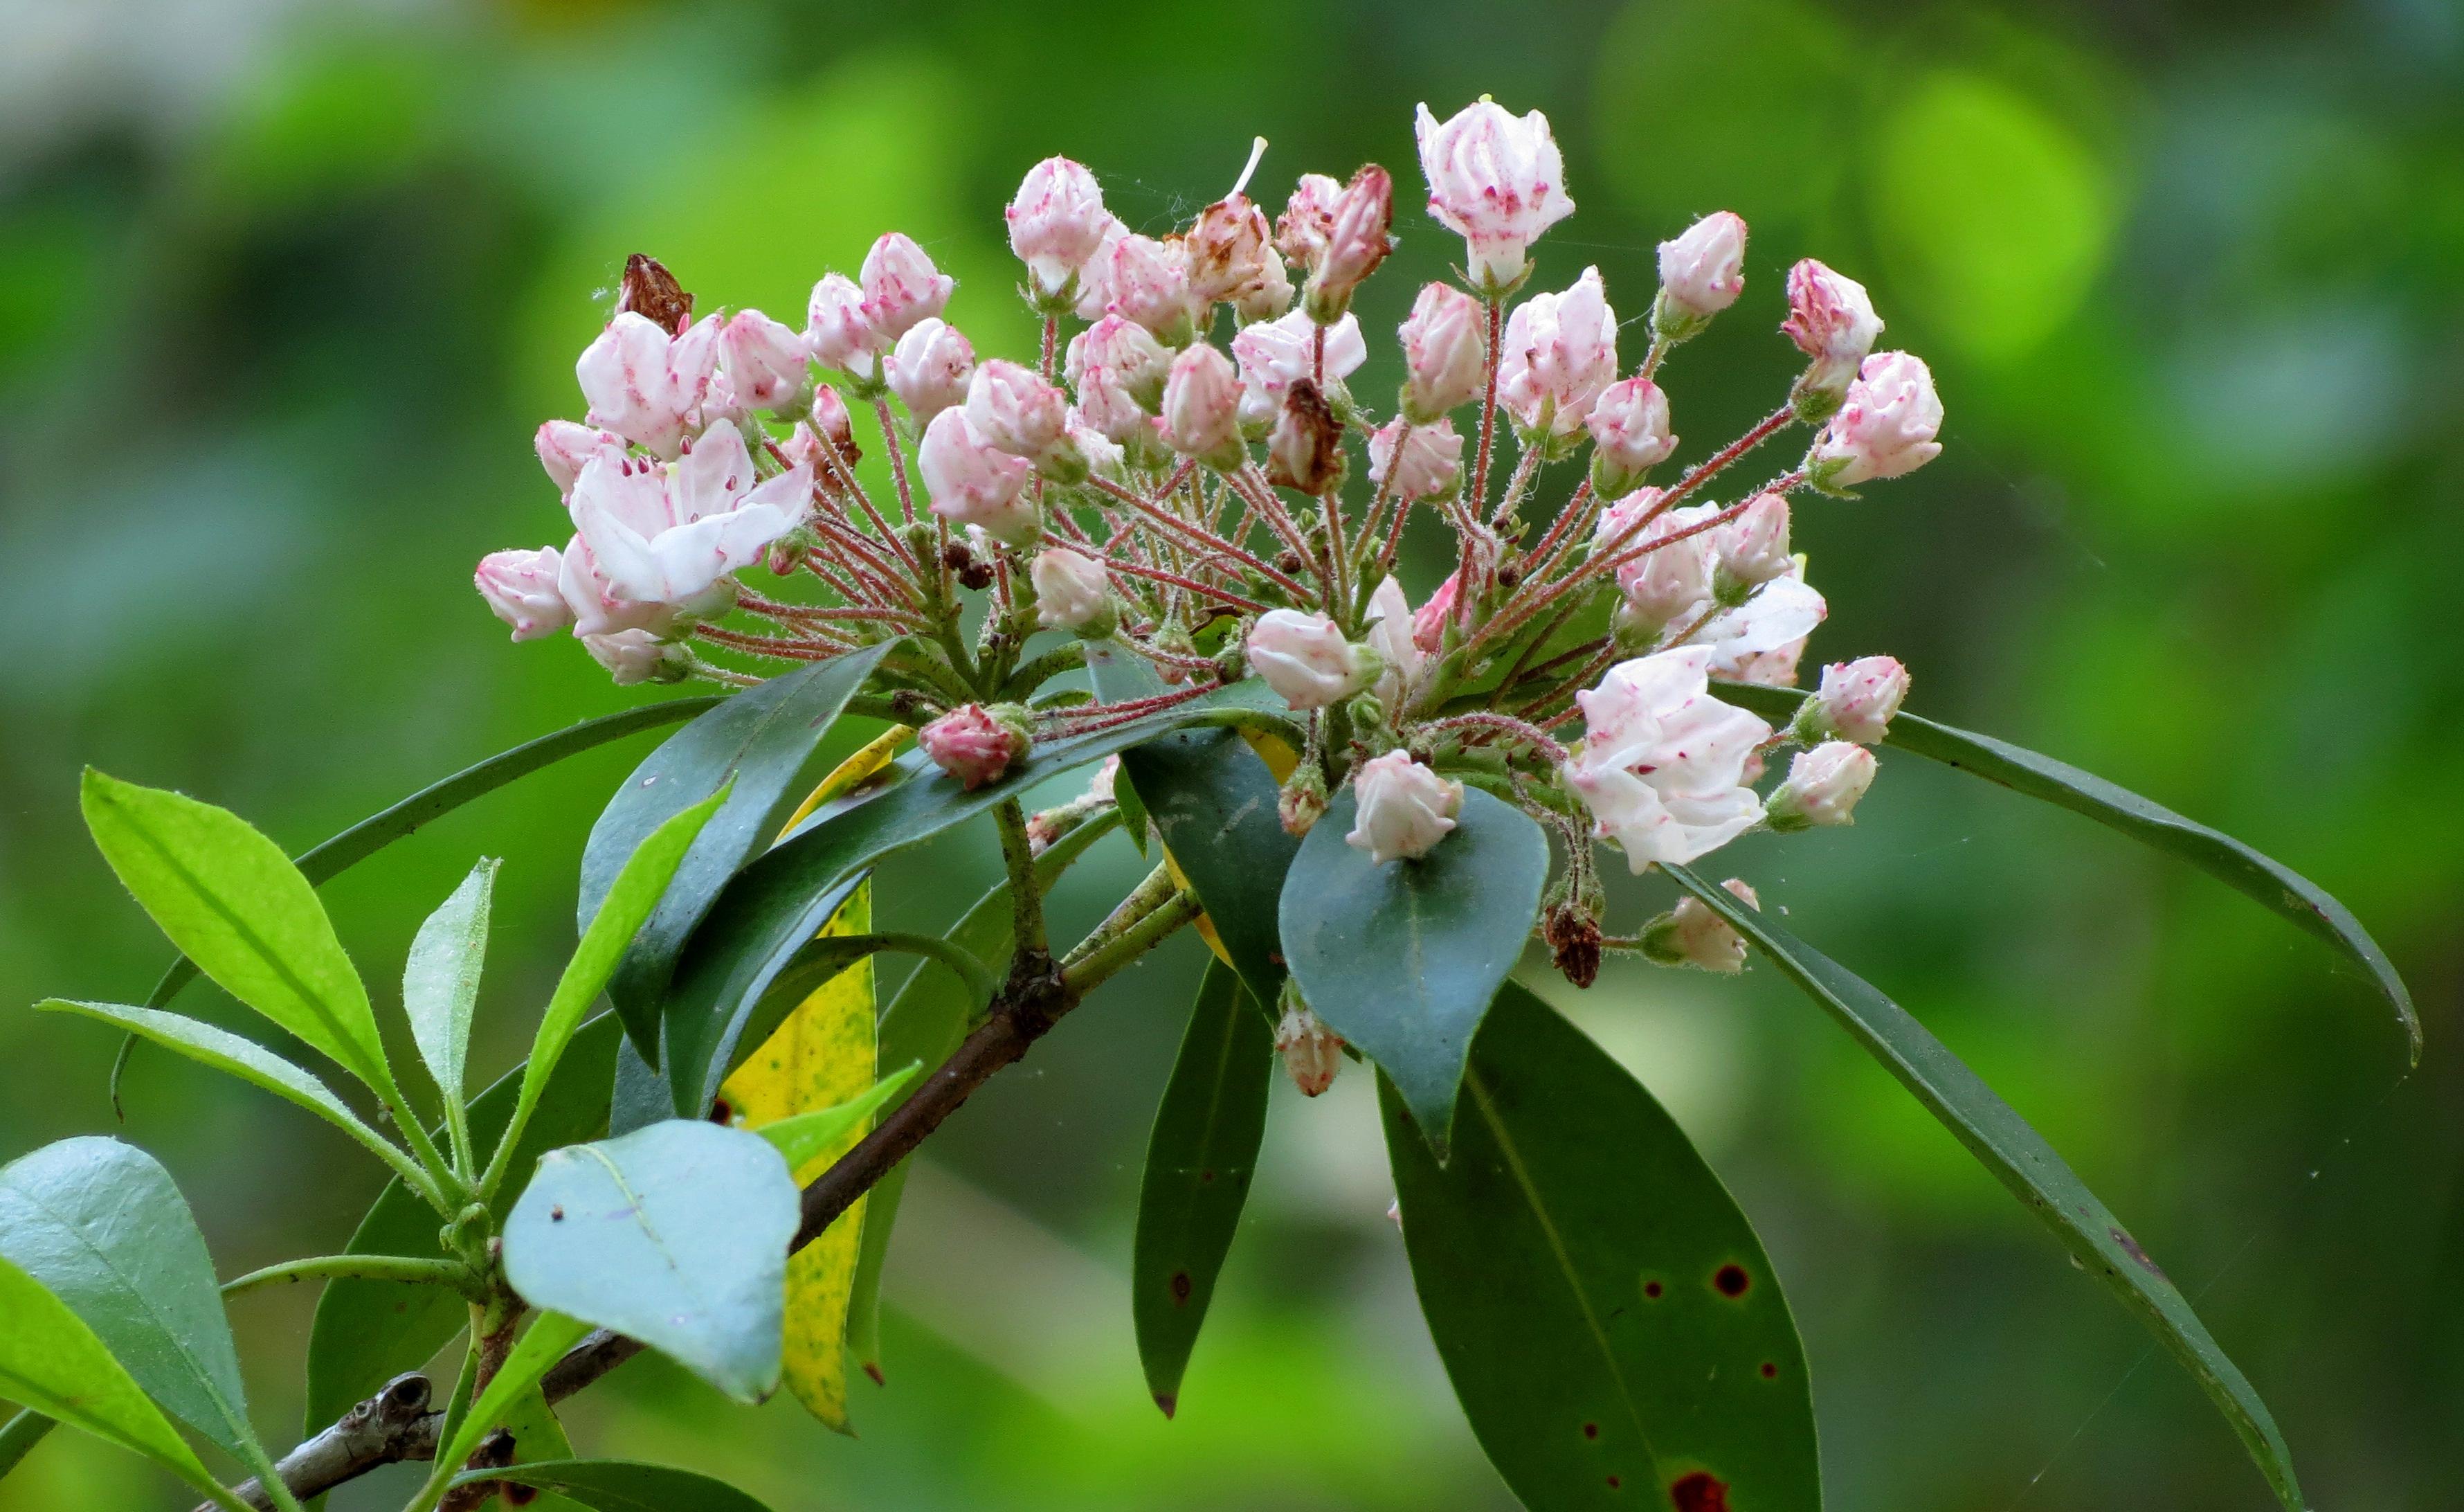 Pink mountain laurel flowers